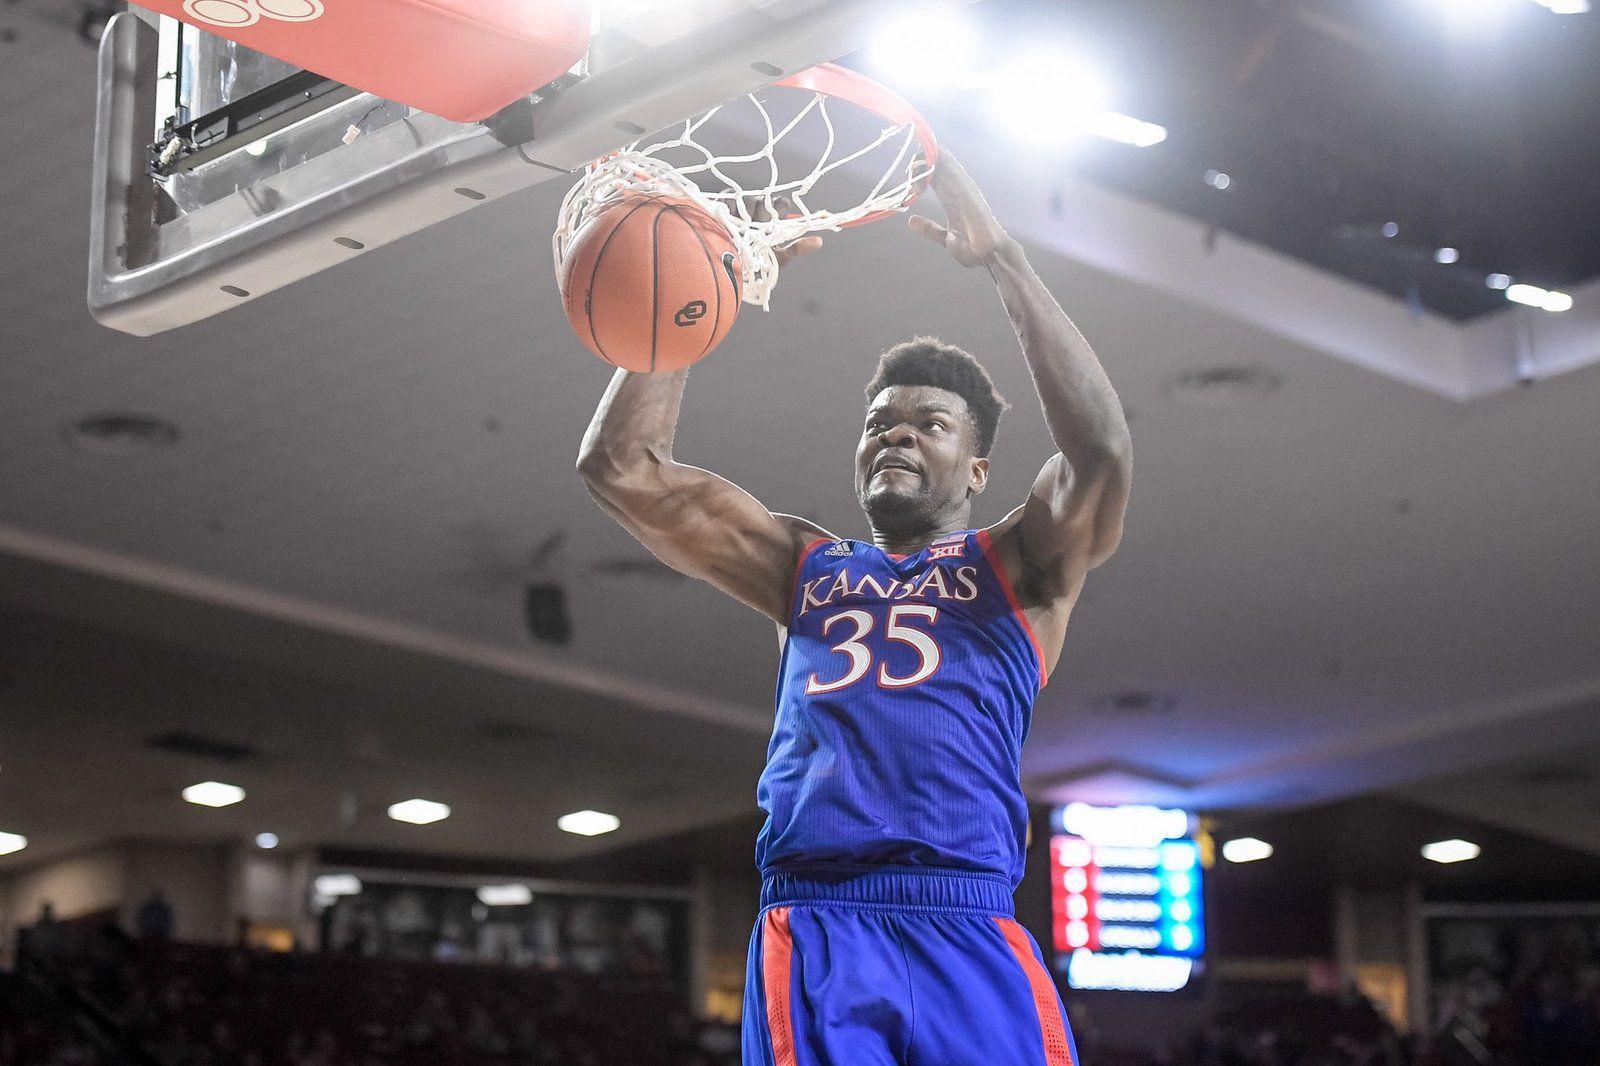 NCAA : Udoka Azubuike mène Kansas à Oklahoma avec un double-double